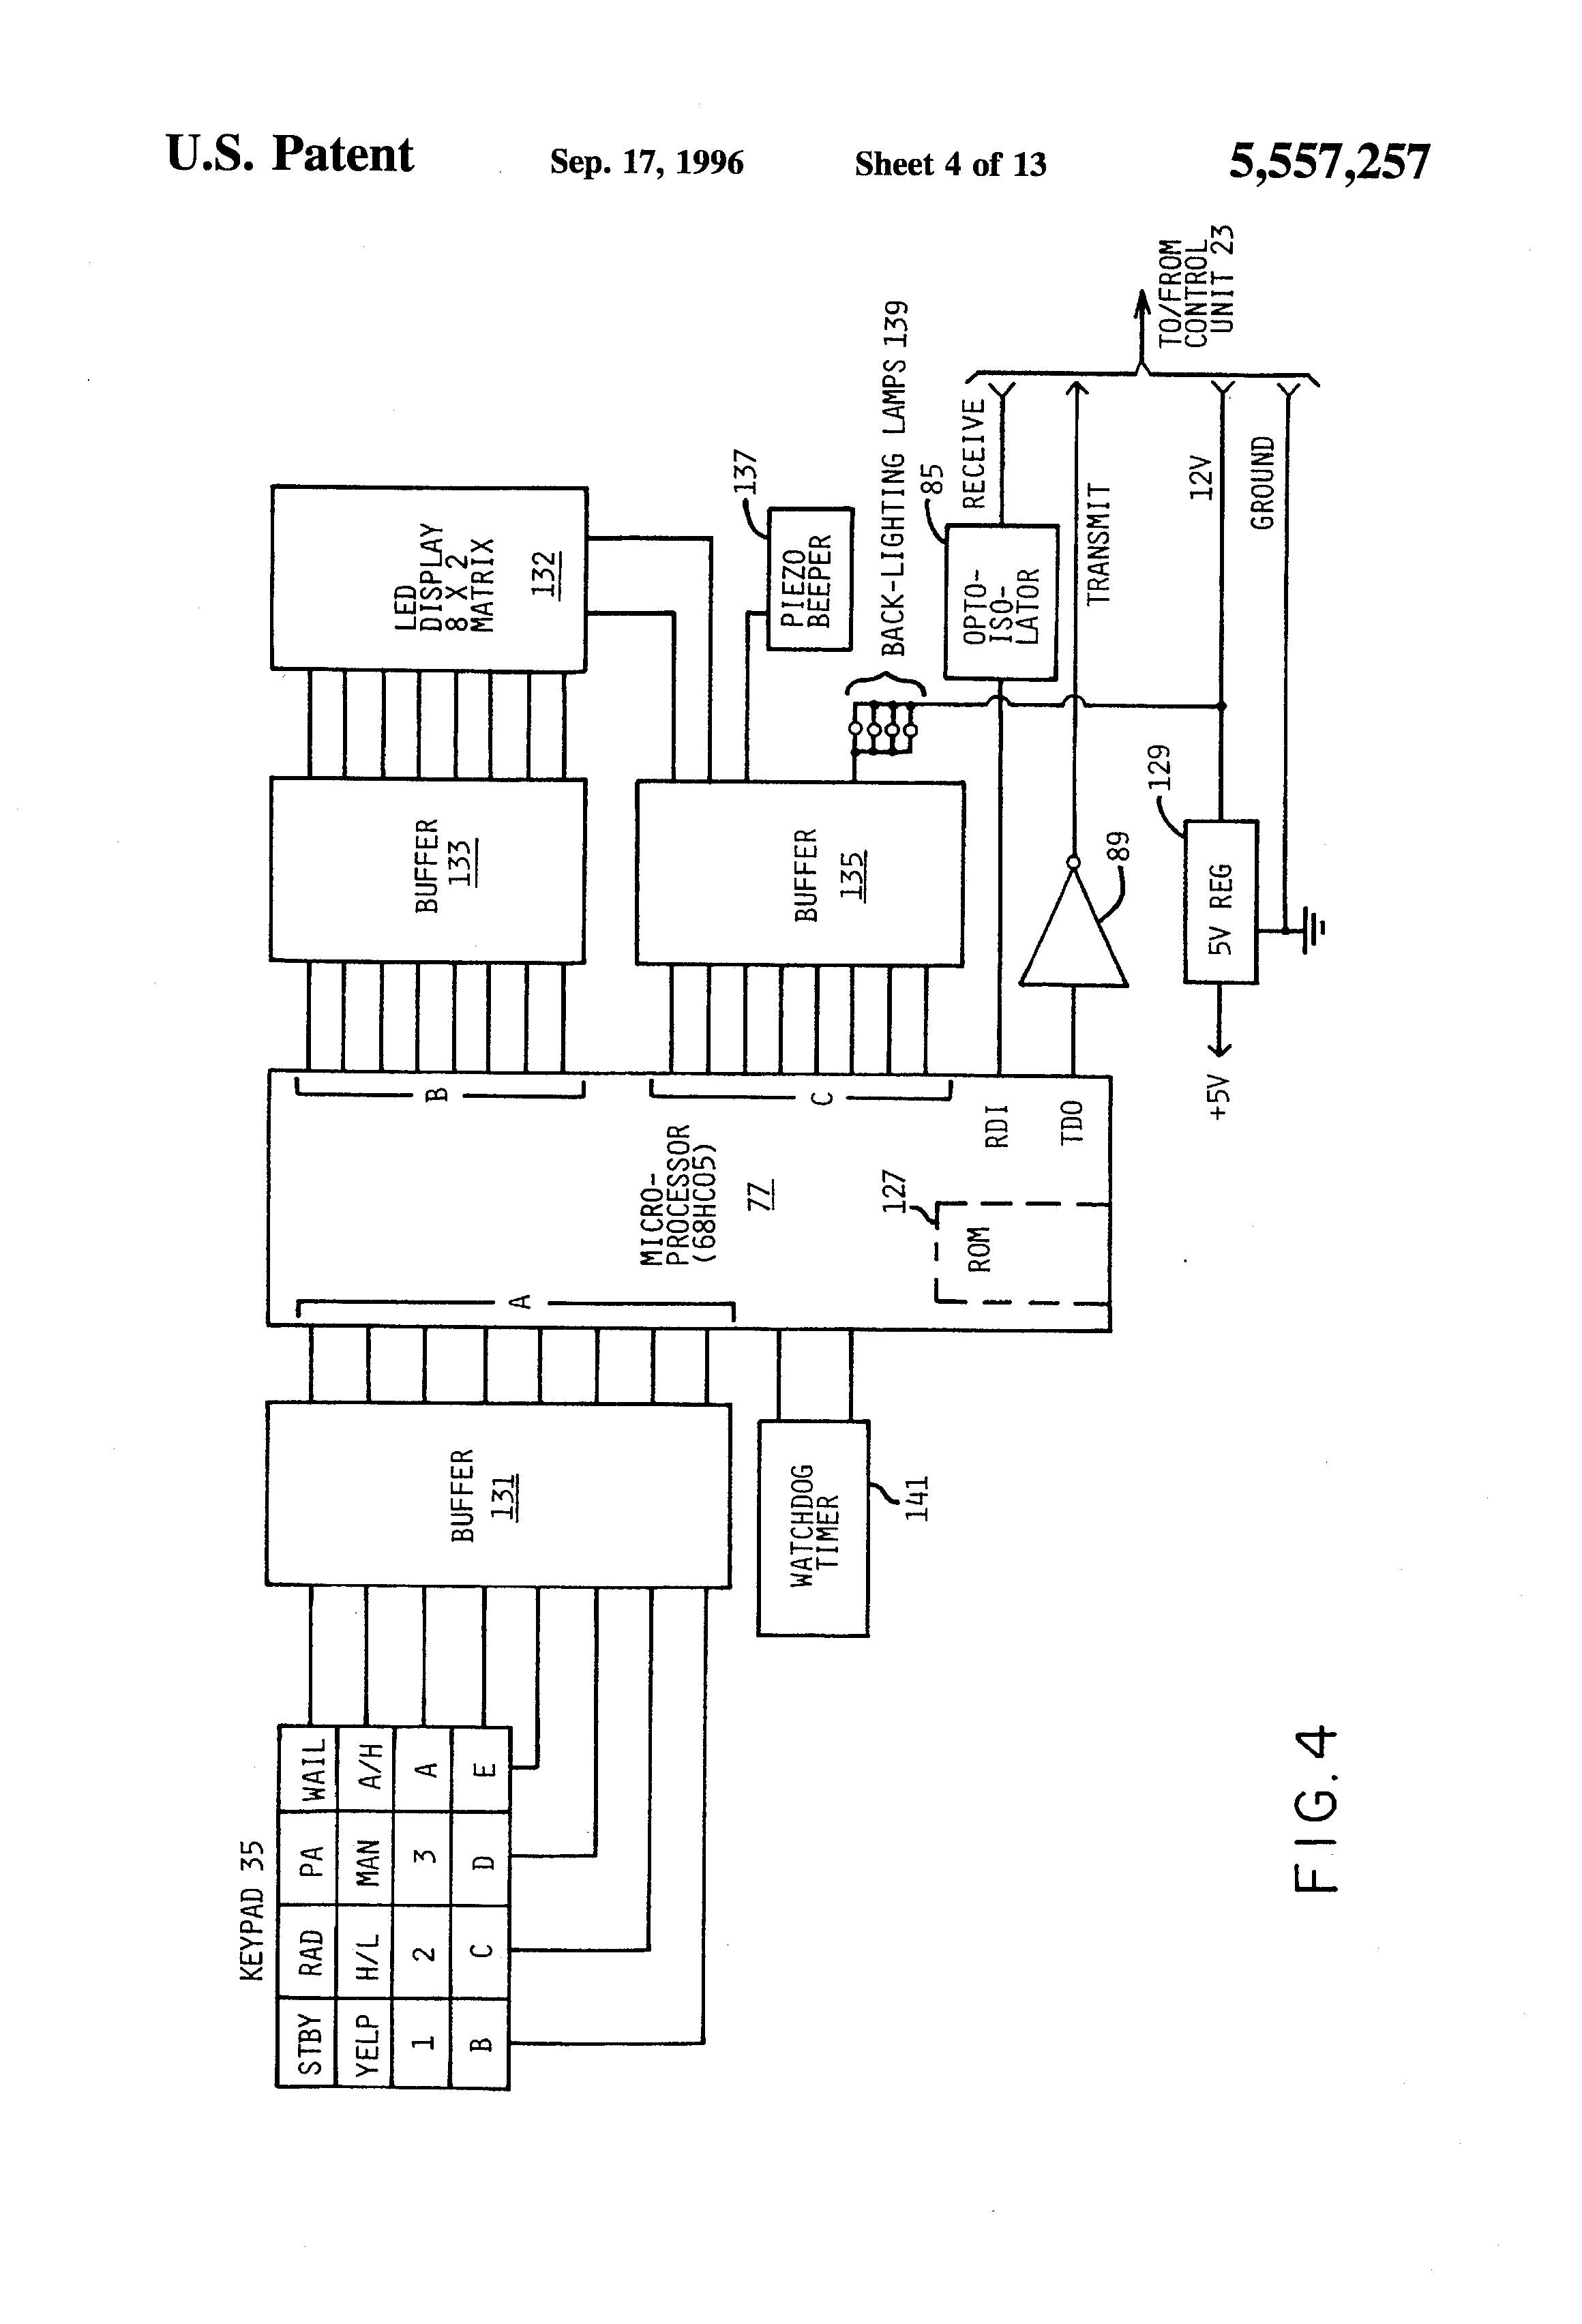 Diagram Code 3 Mx7000 Wiring Diagram Full Version Hd Quality Wiring Diagram Networkwiringlosangeles Parkhotelginevra It